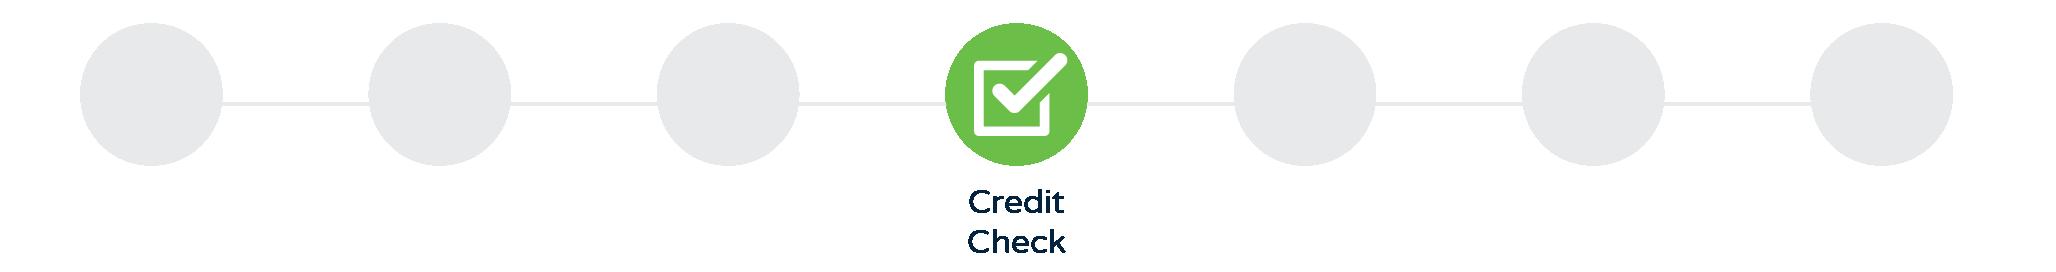 Credit Check - Progress image